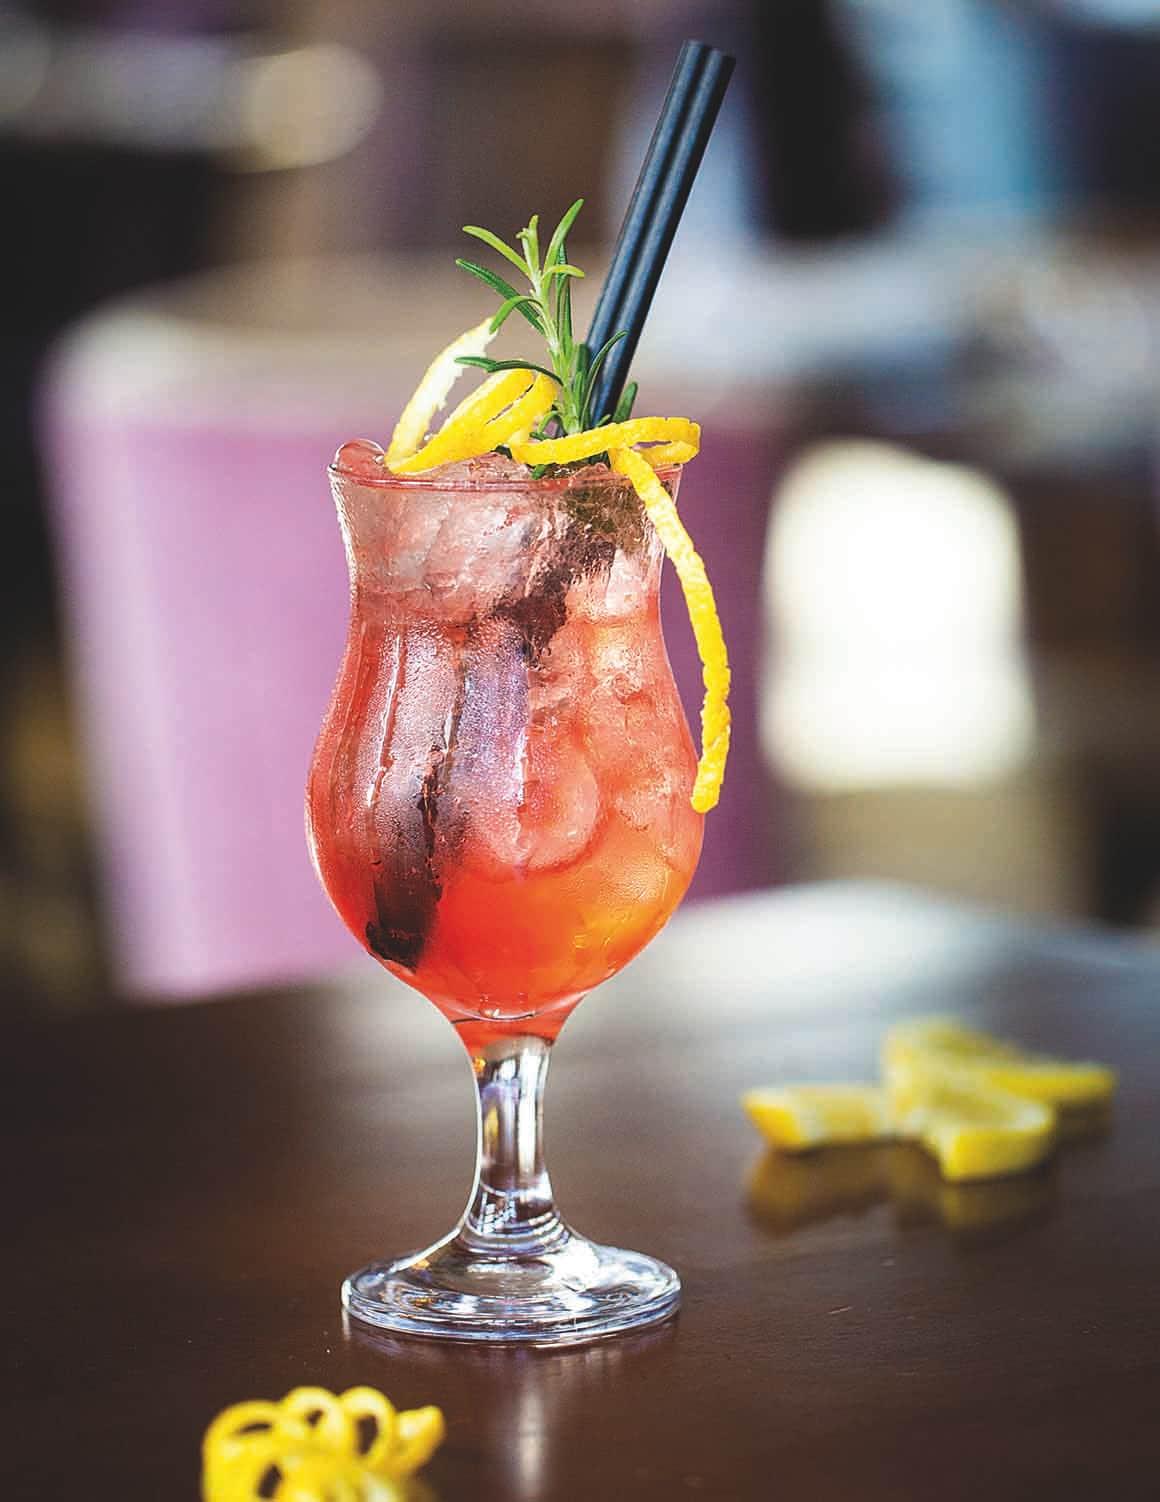 Cocktail Bar at The Arden hotel in Stratford-upon-Avon